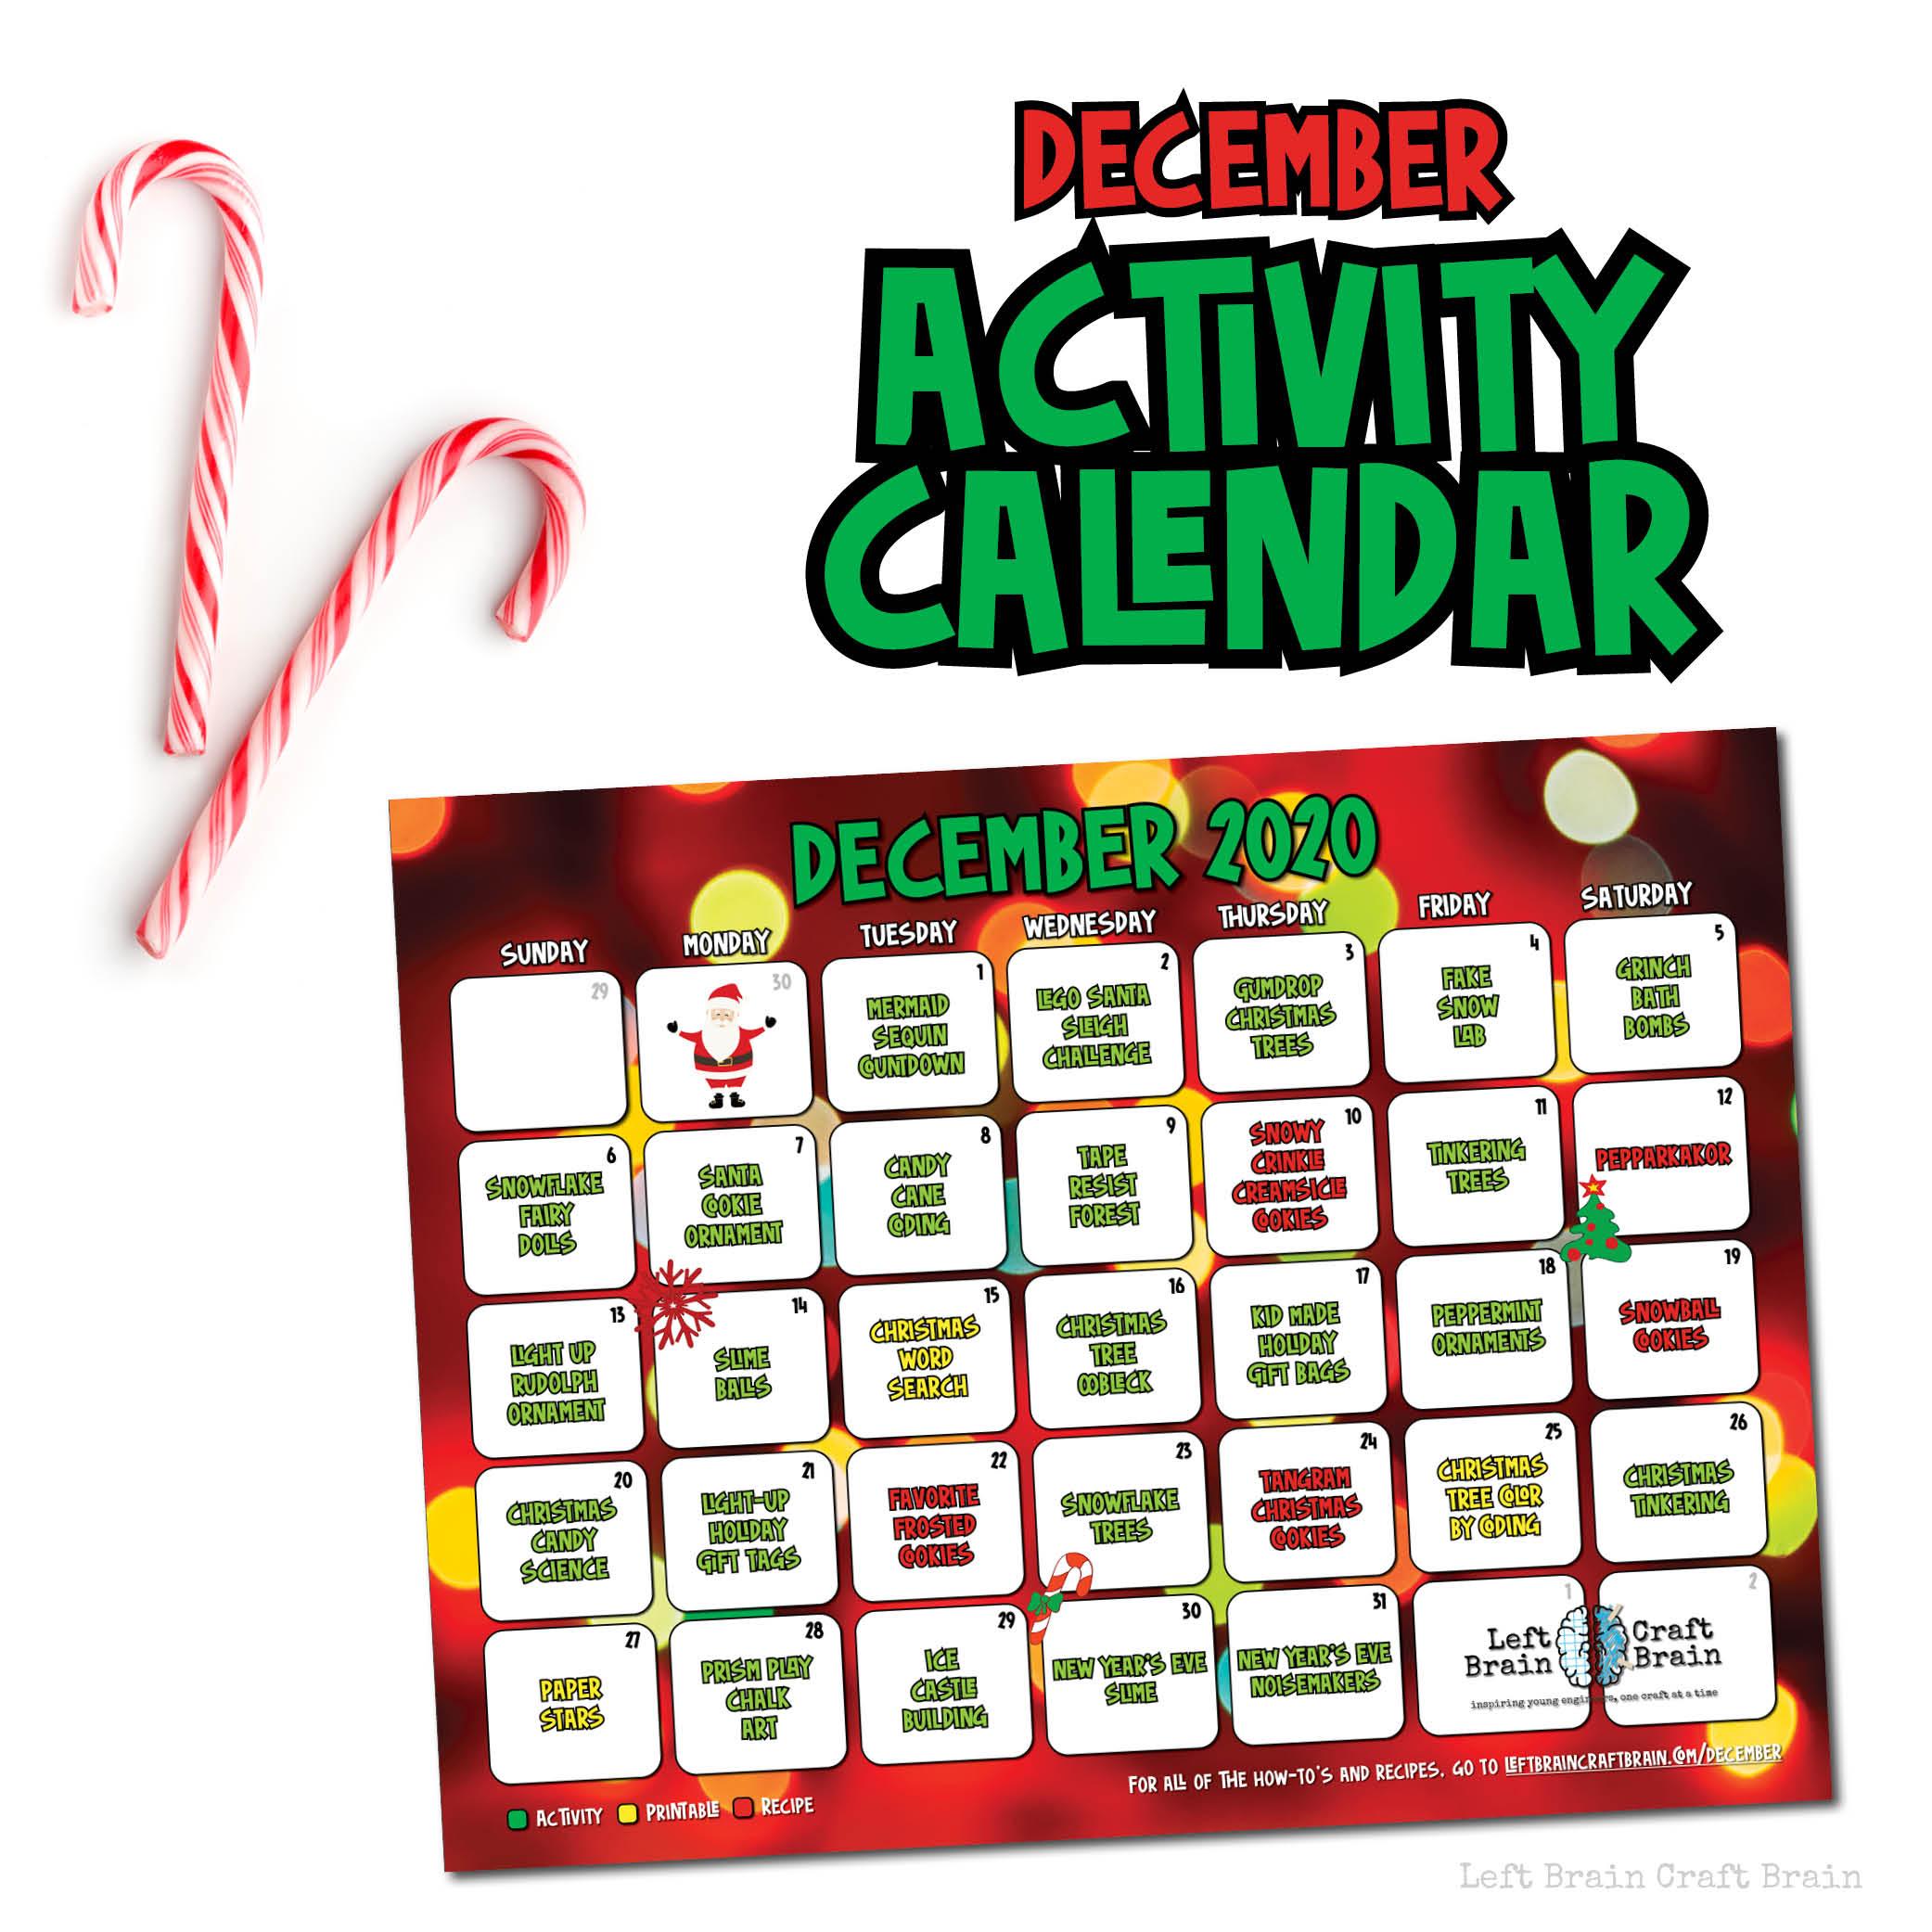 december activity calendar mockup 2020